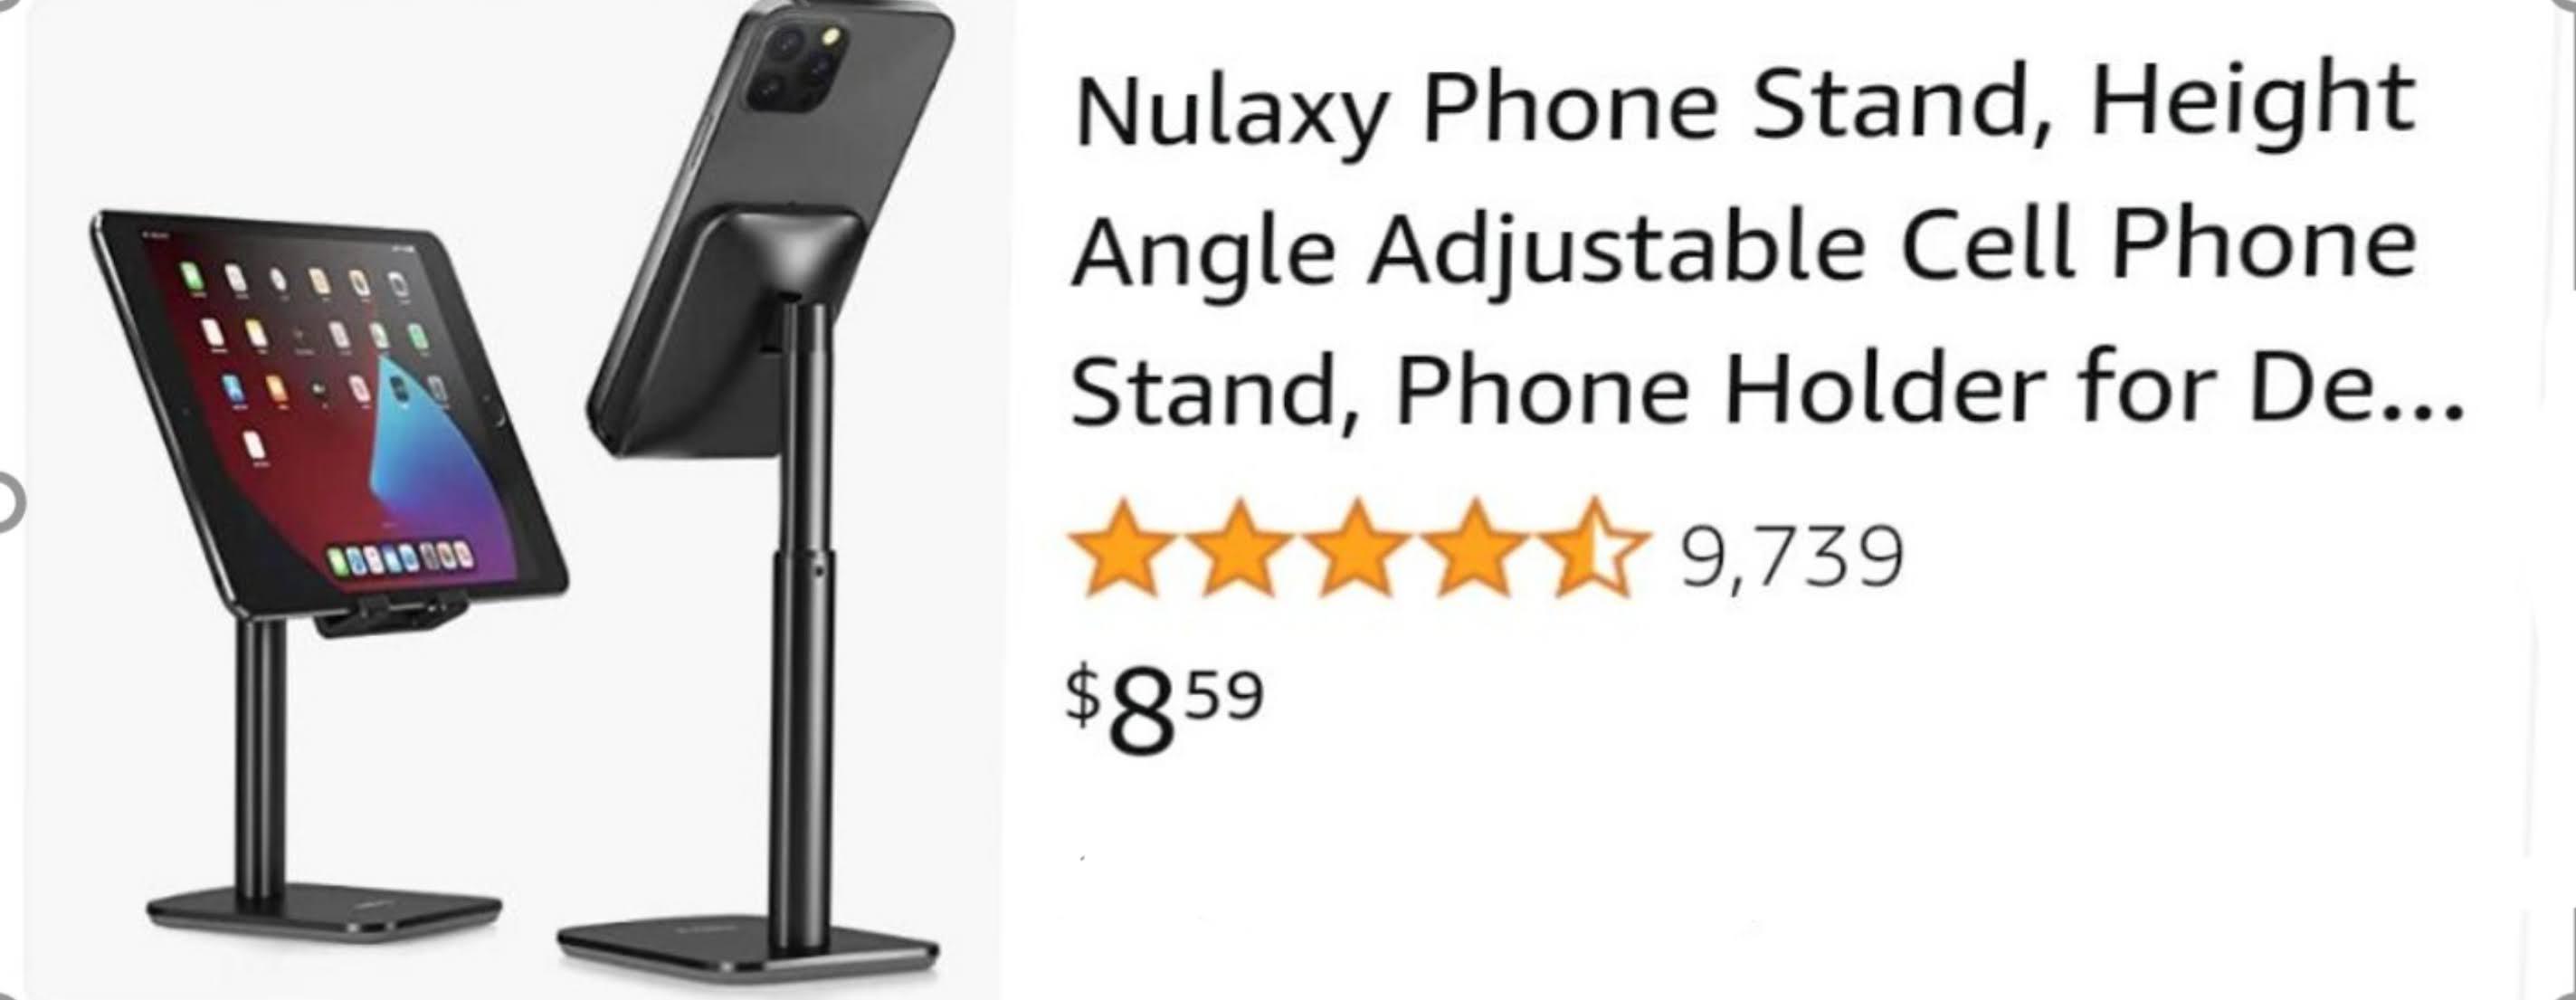 nulaxy phone stand $8.99